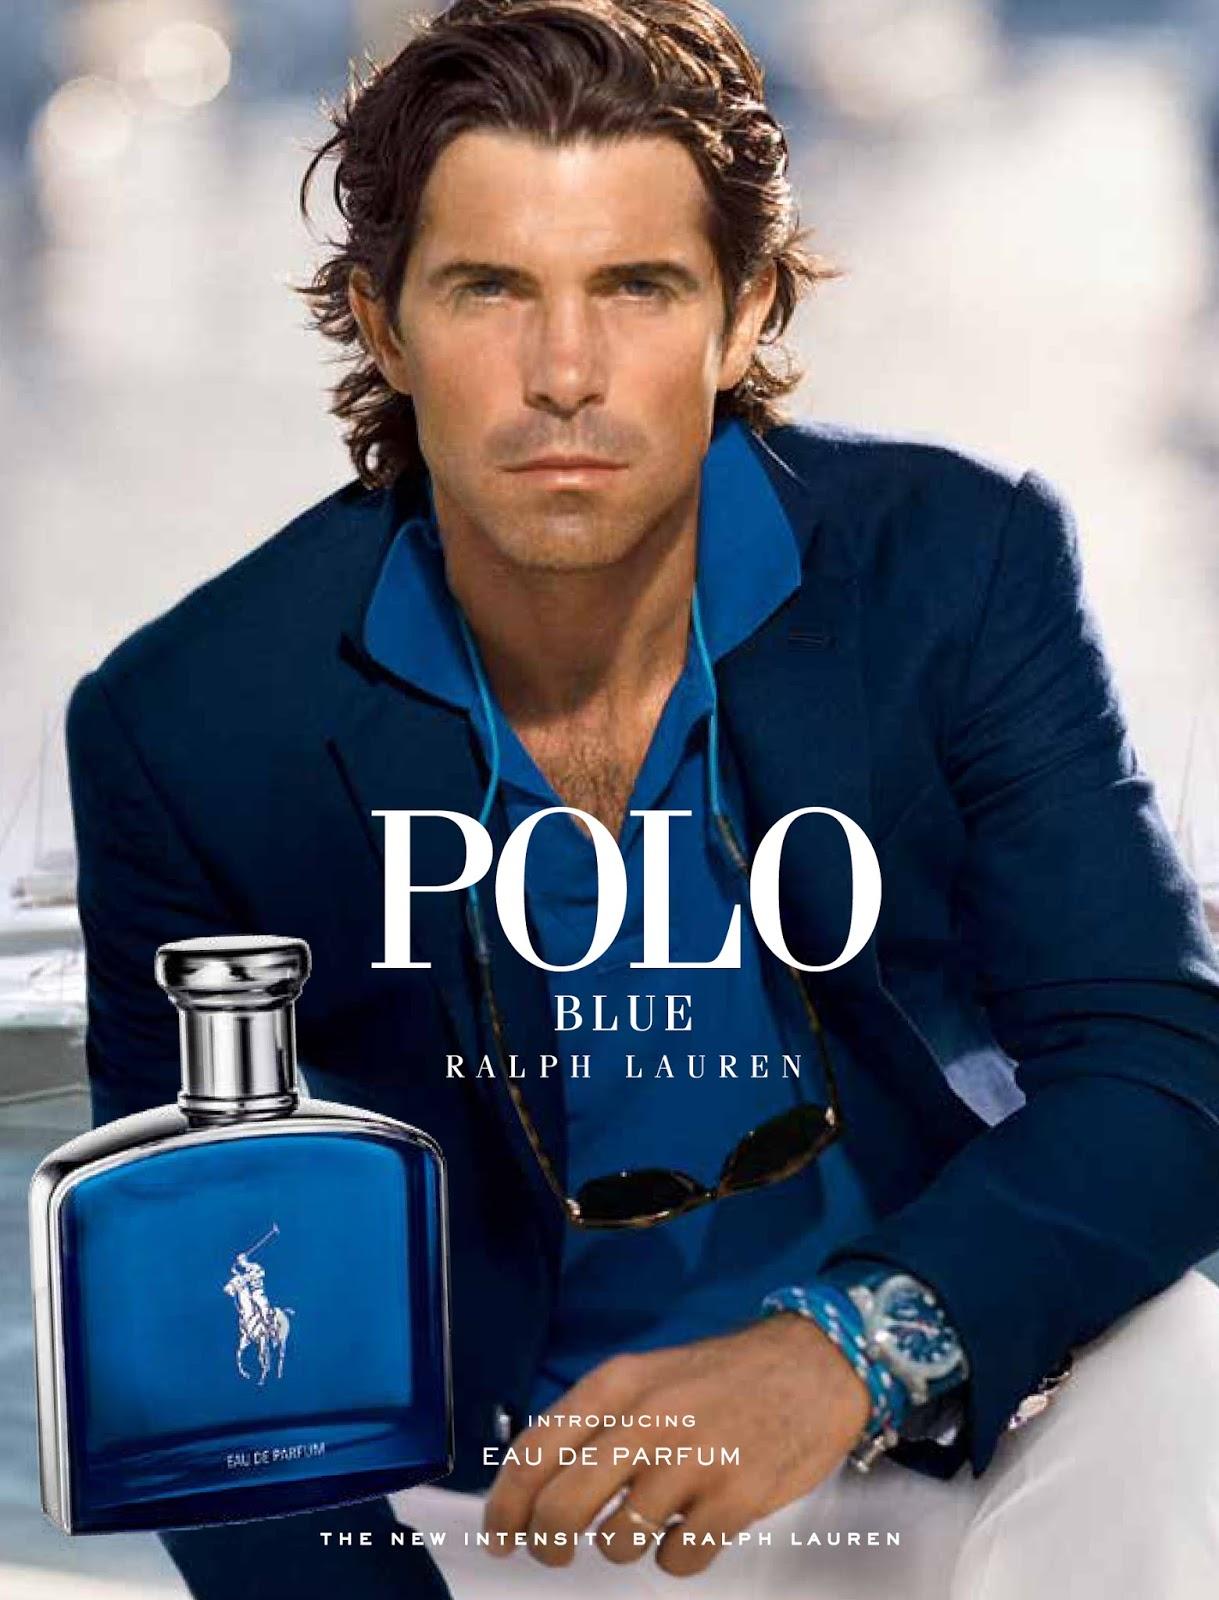 854f10b282 SPECIAL OFFER   Ralph Lauren Polo Blue Eau De Parfum - WhatLauraLoves